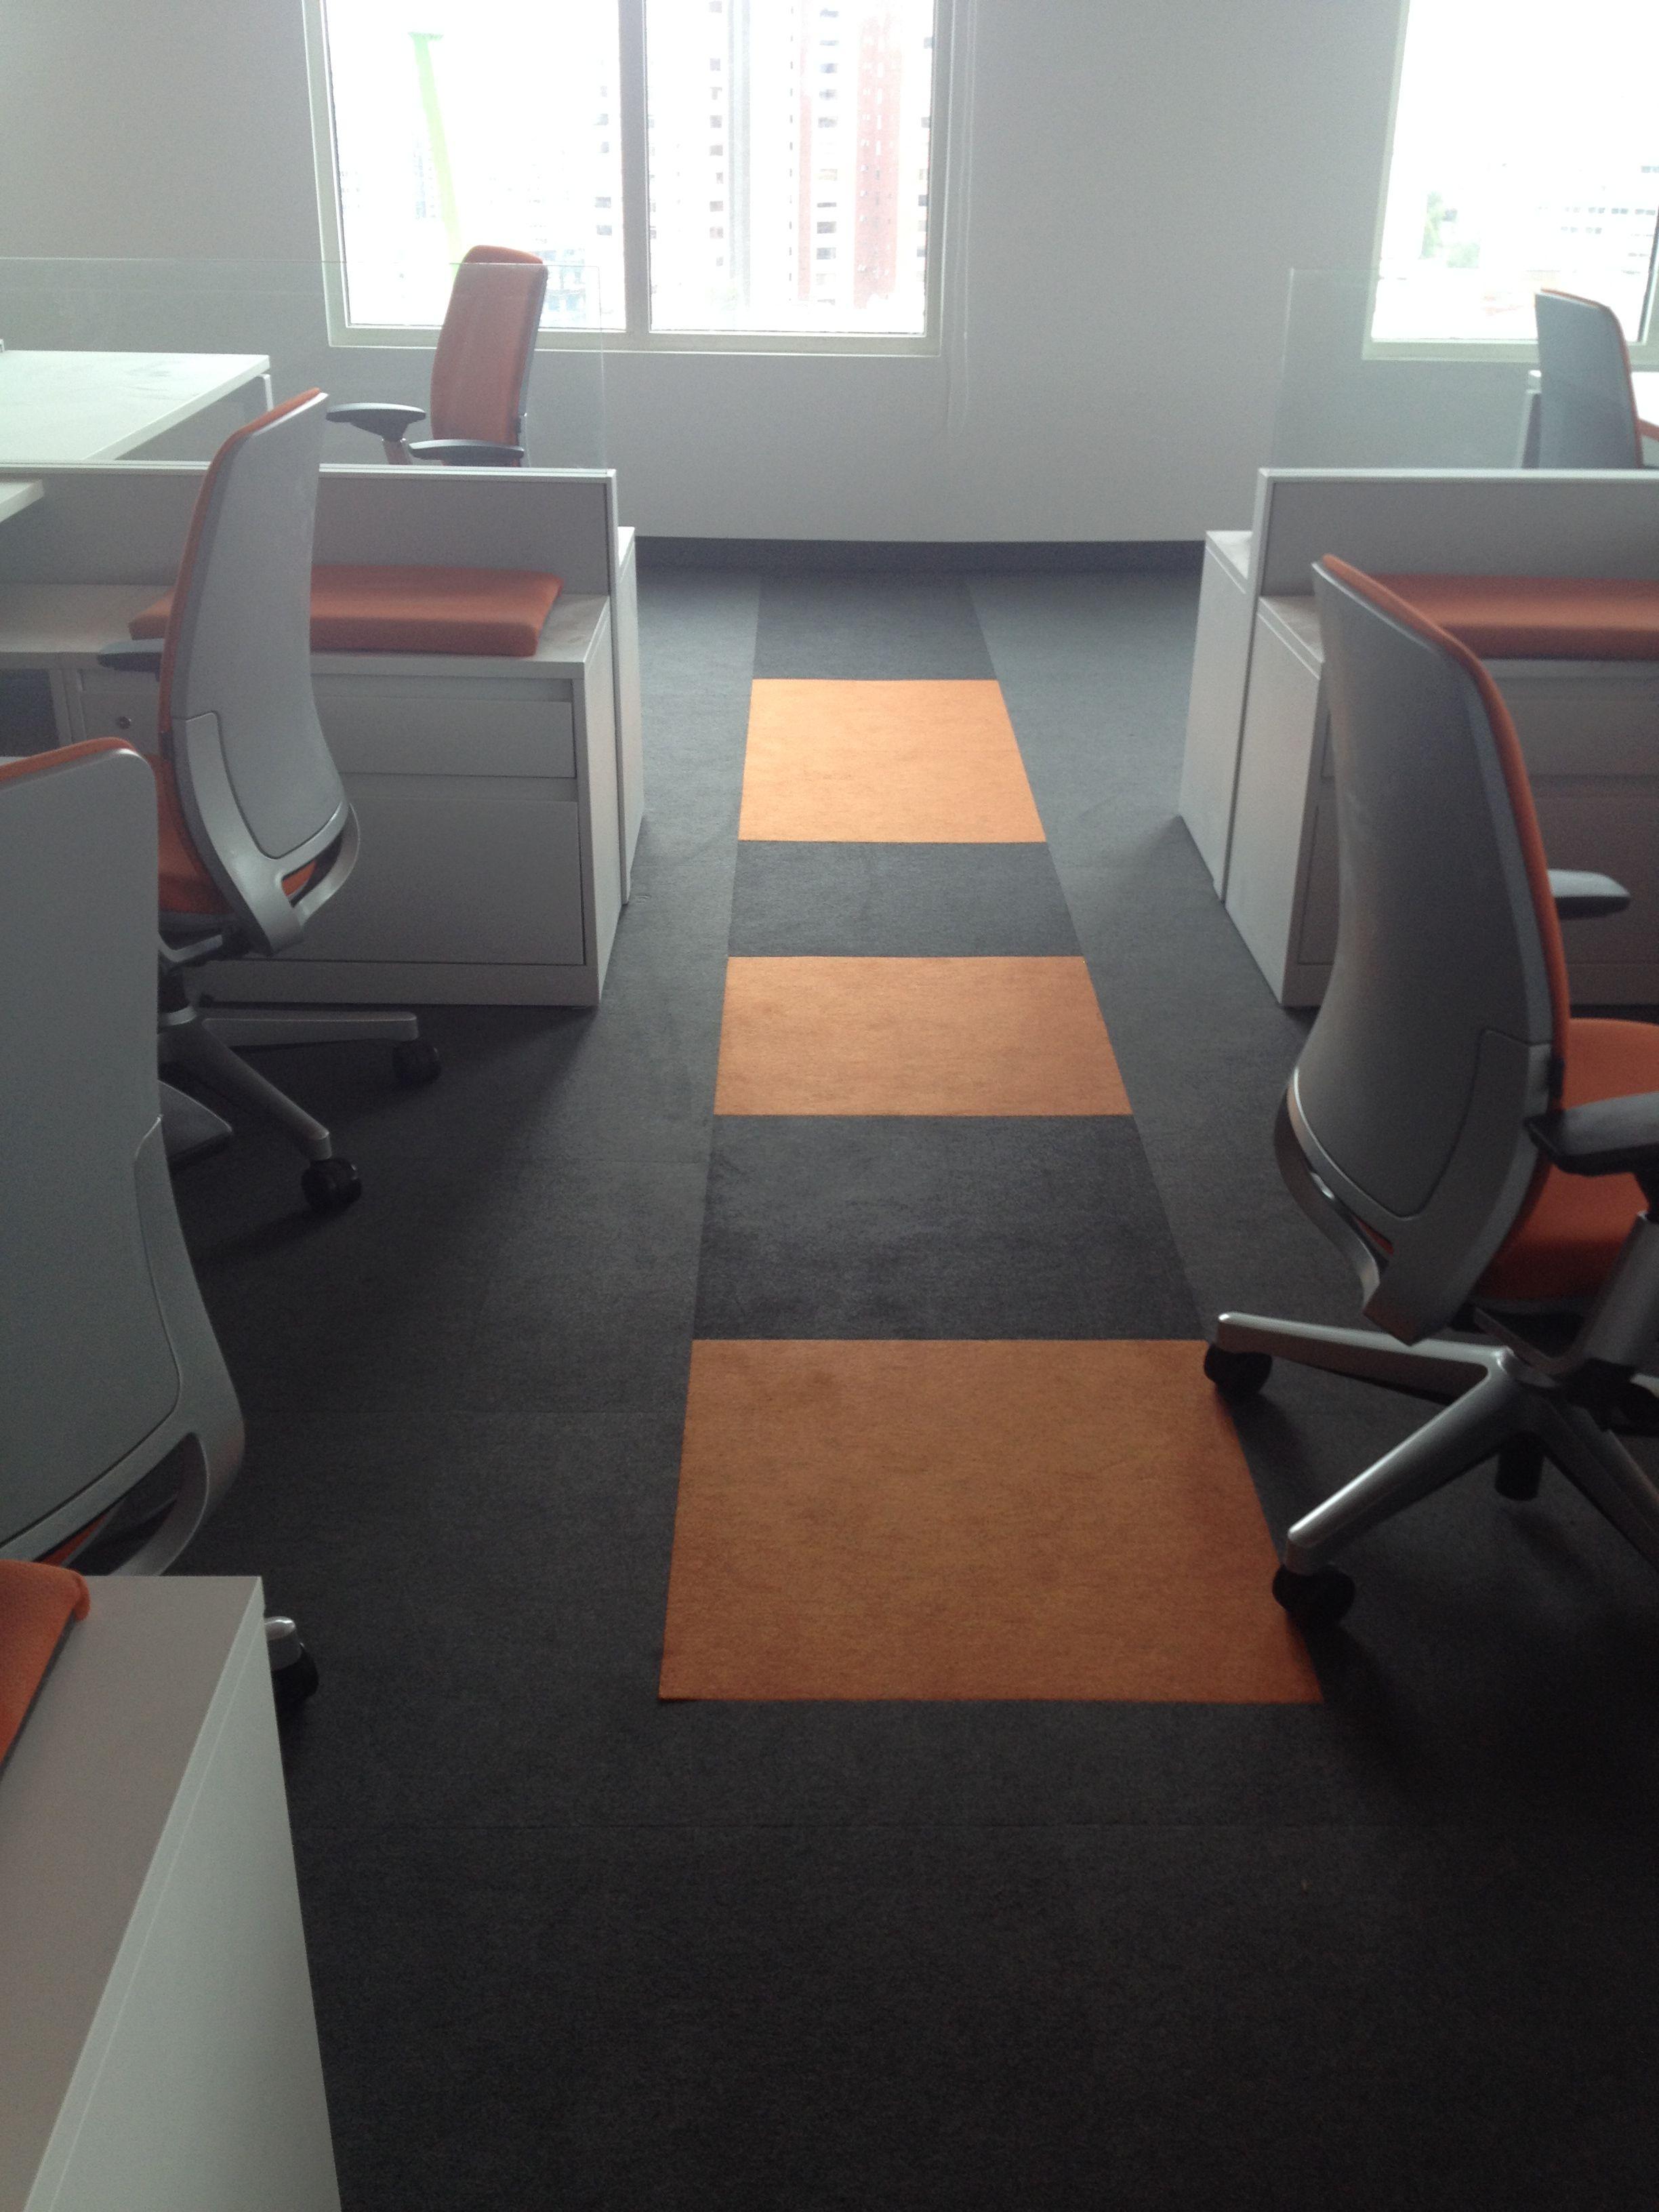 Svelte by bolyu 24 x 24 felt floor tile bolyu level series svelte by bolyu x felt floor tile doublecrazyfo Choice Image